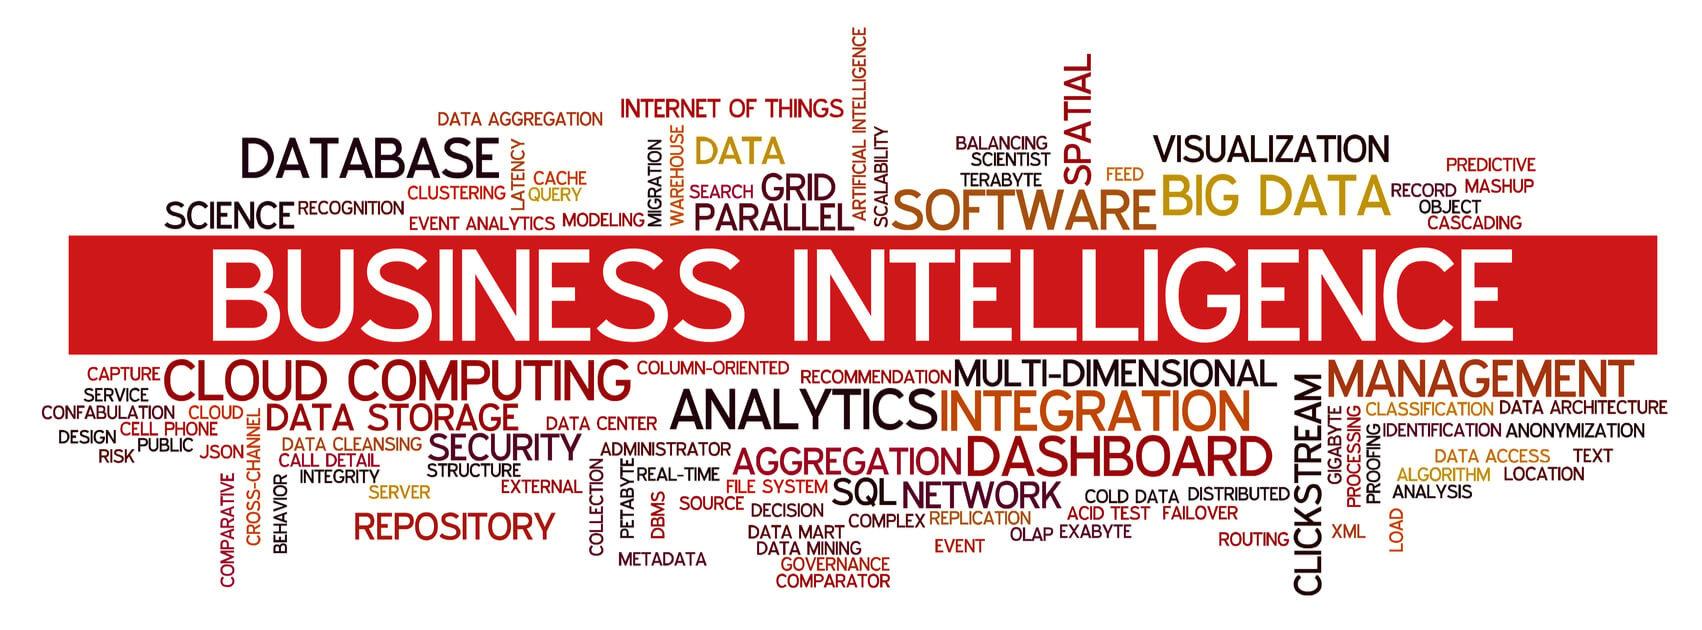 título business intelligence com diversos termos relacionados